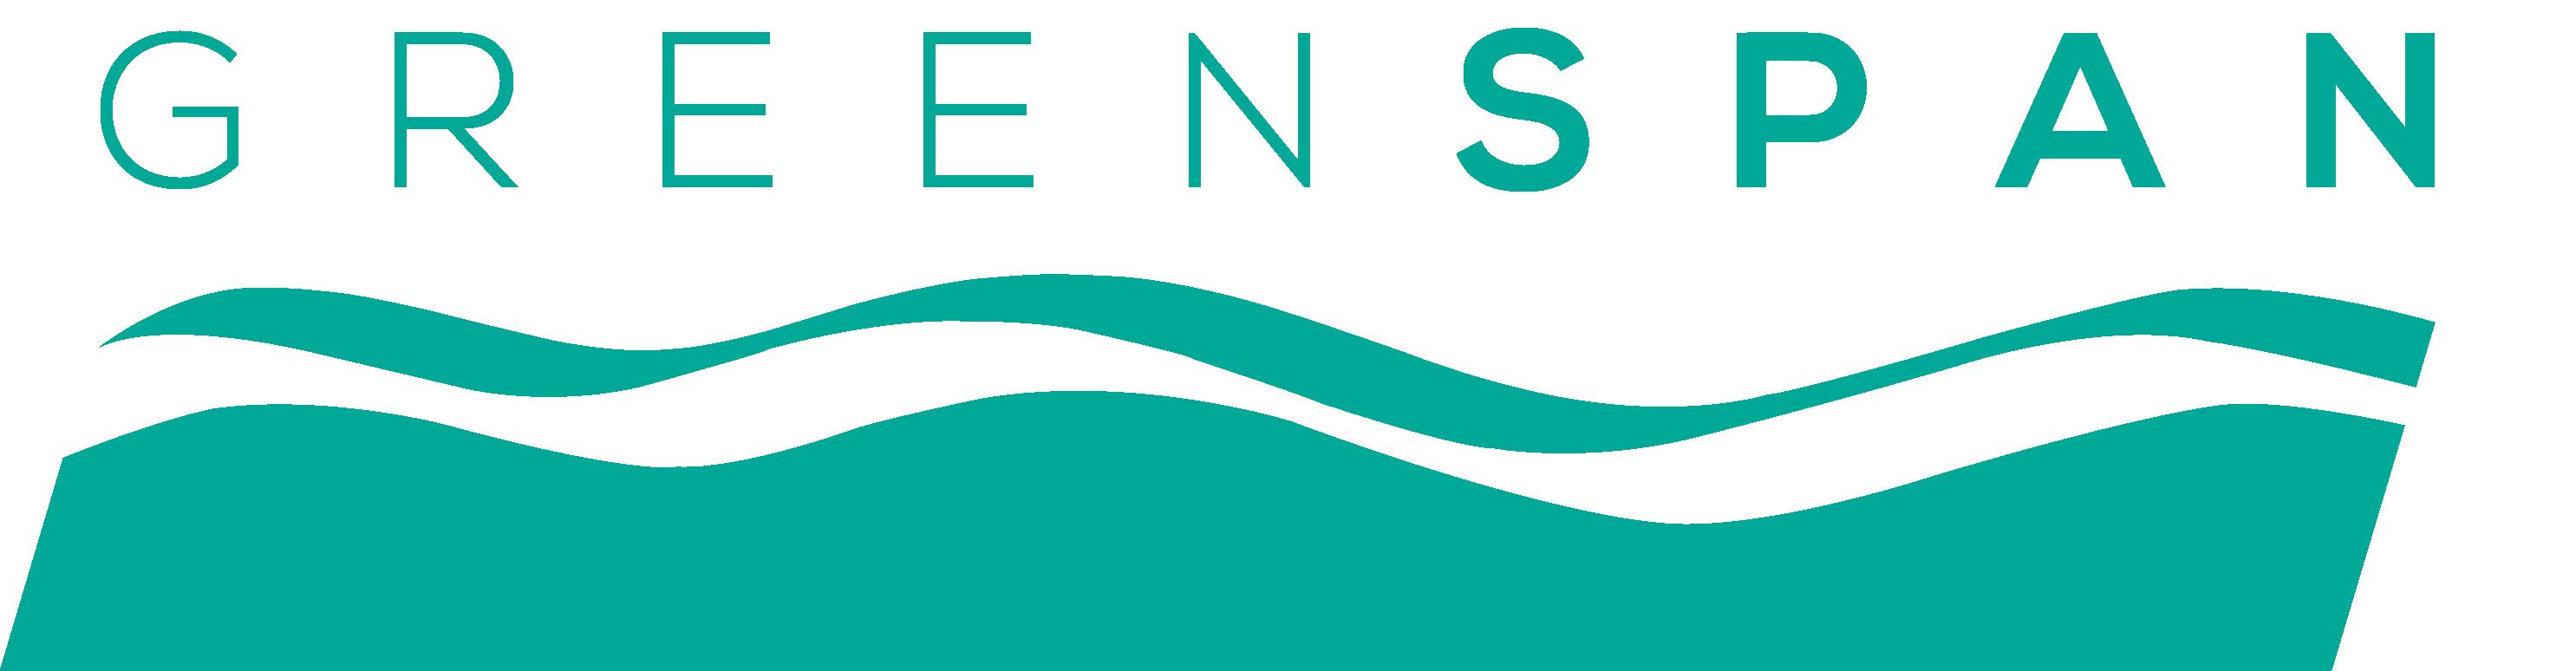 Greenspan logo